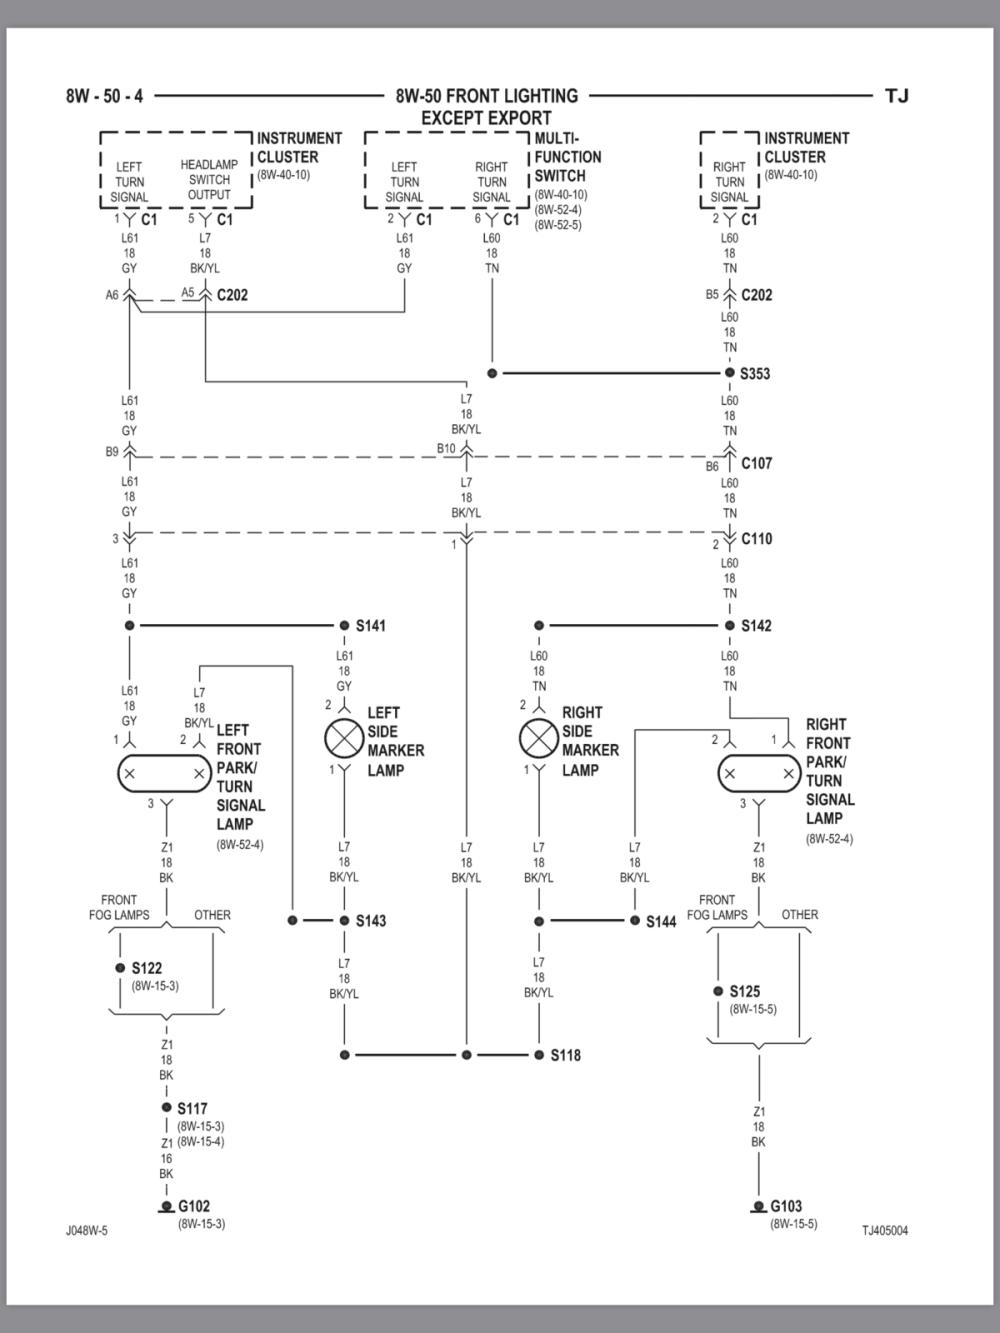 medium resolution of 9c5cc876 4e5a 4891 8805 39149adadfdc png